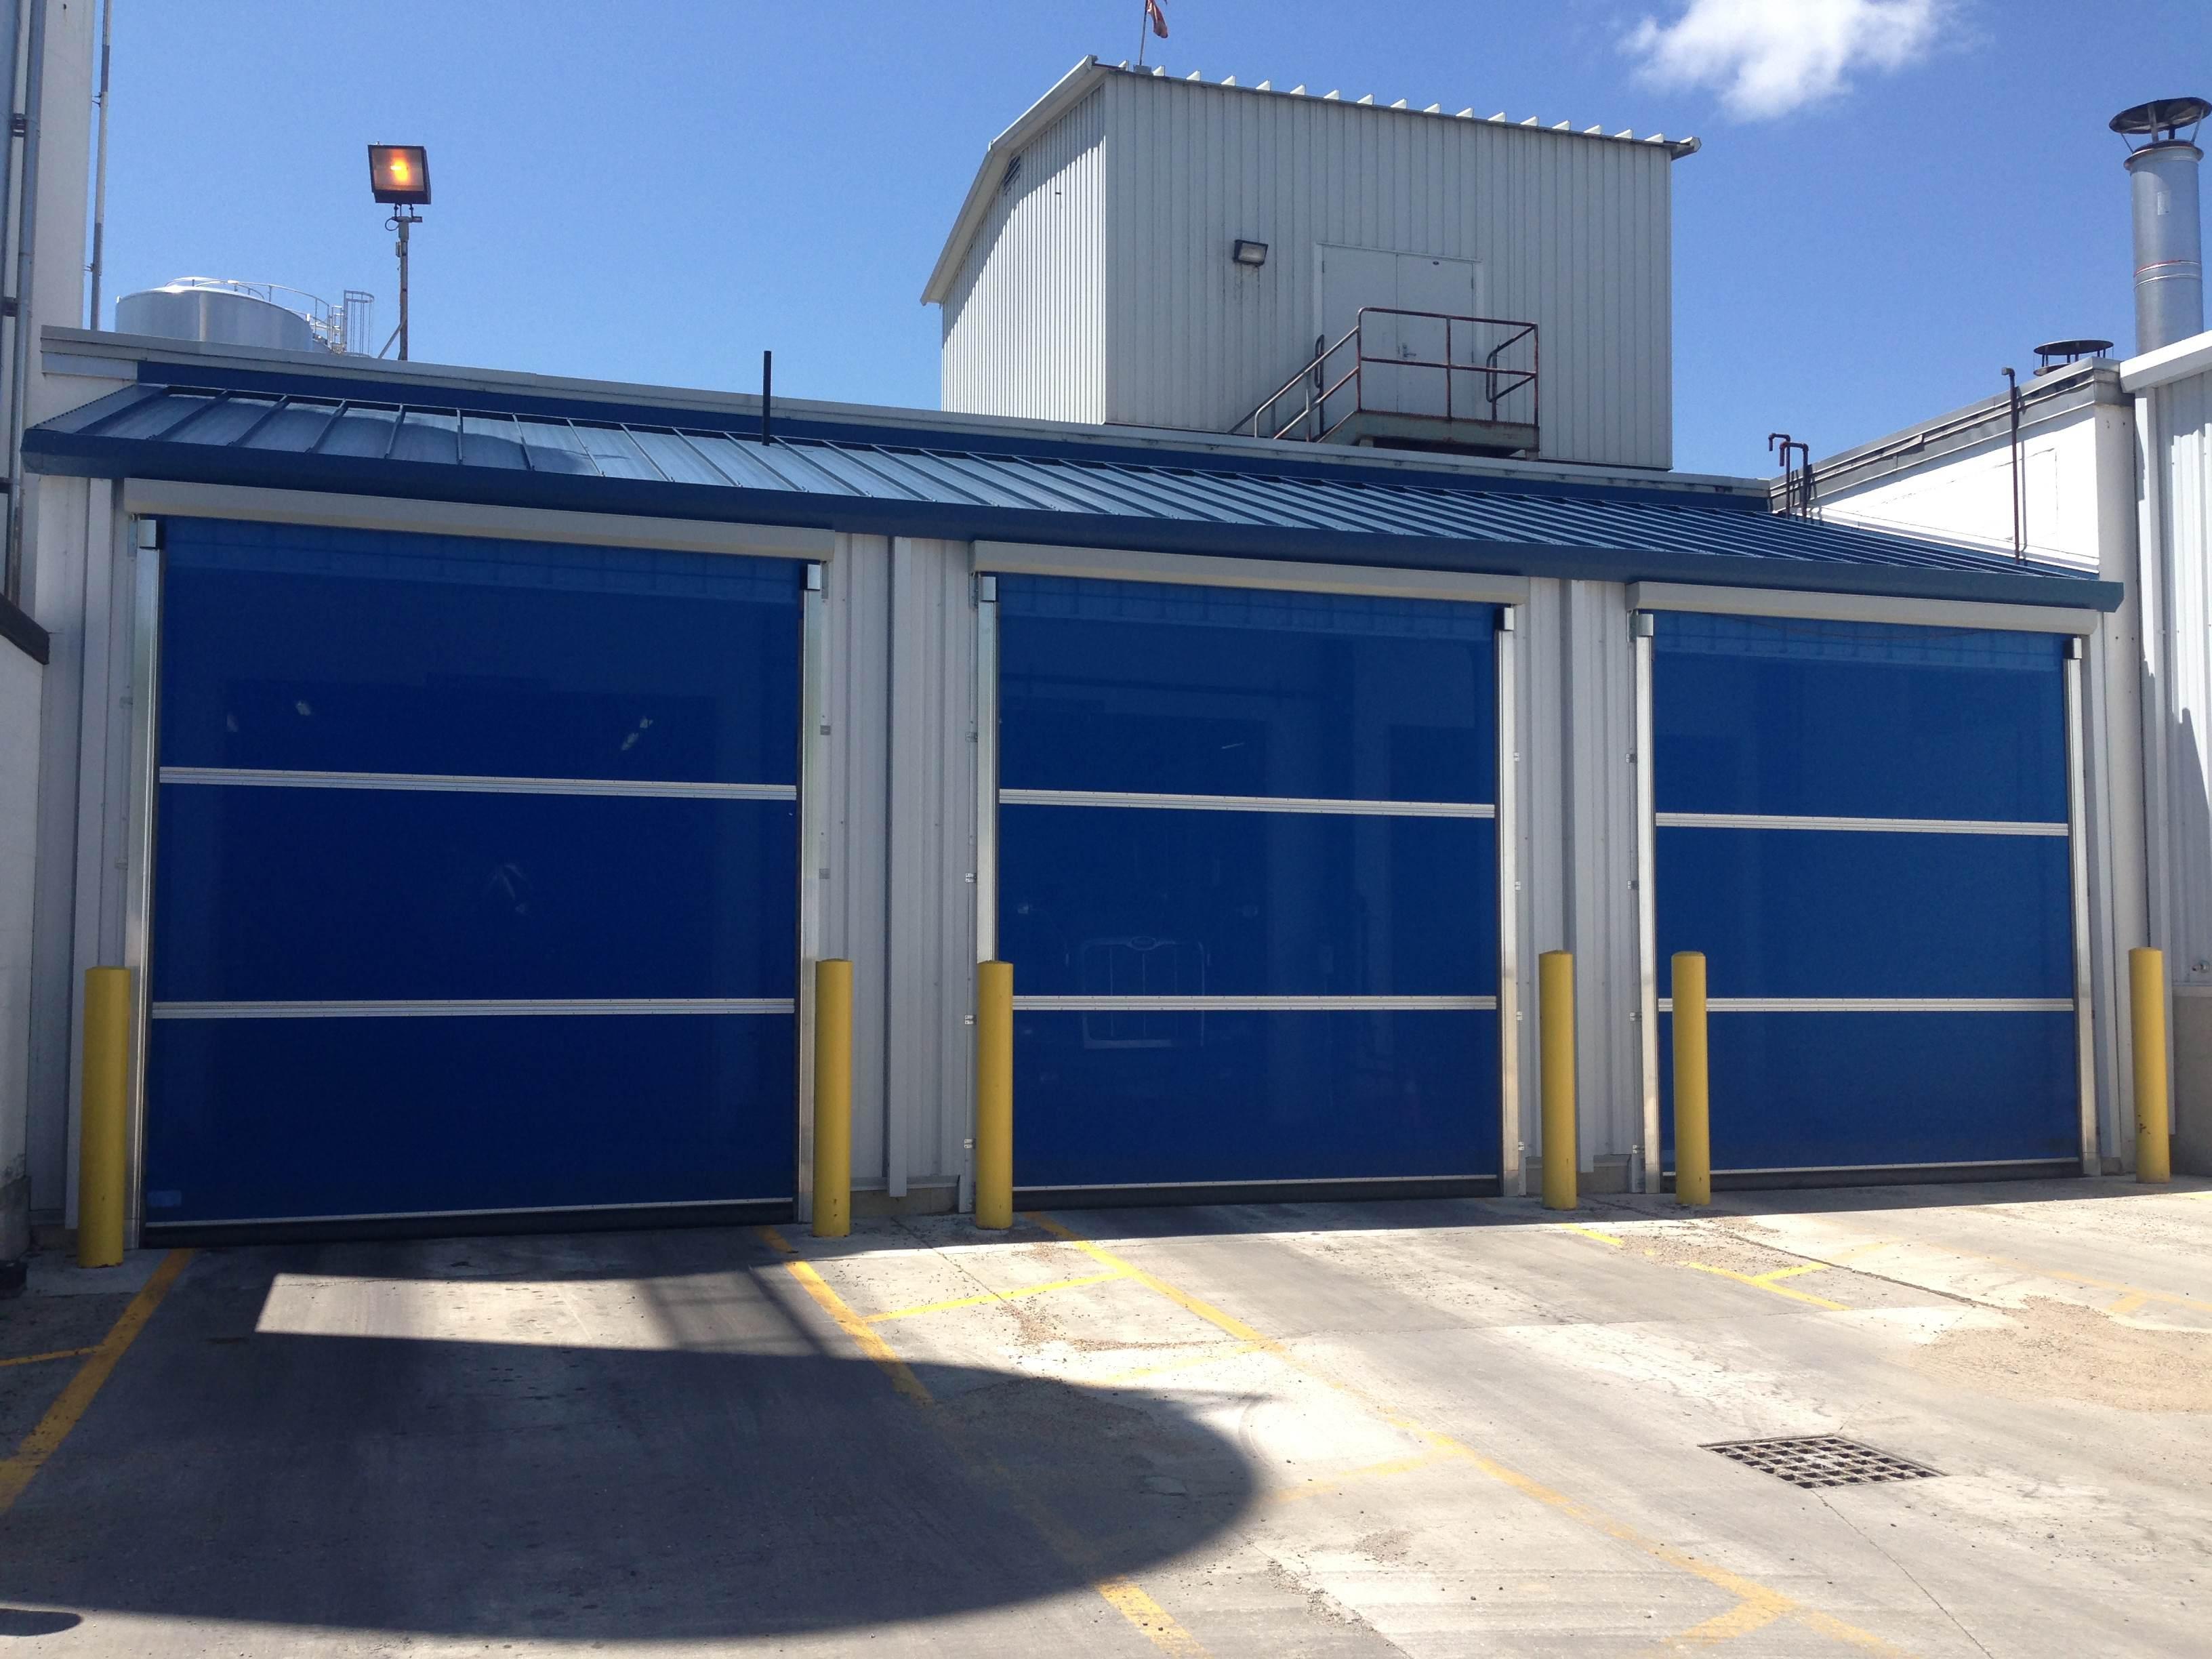 garage genie door max manual instructions superb efcaviationcom wiring blue doors opener